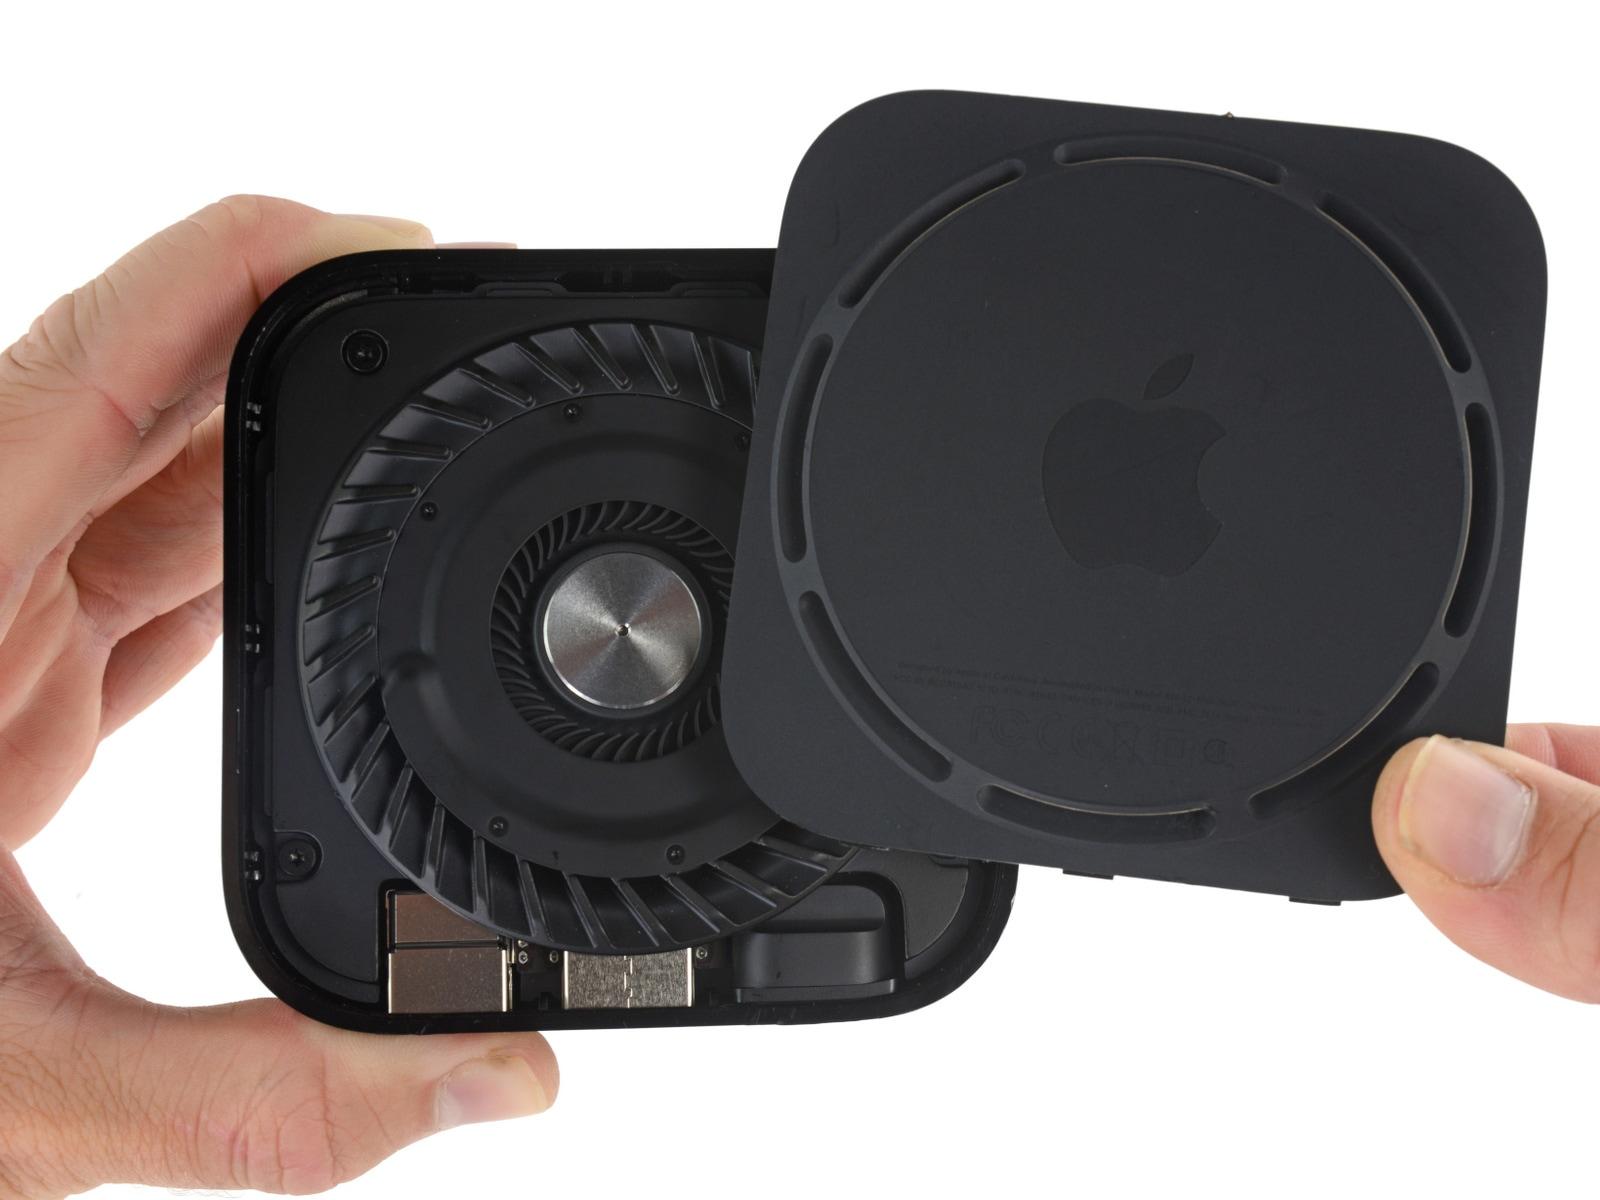 Desmontagem da Apple TV 4K pela iFixit